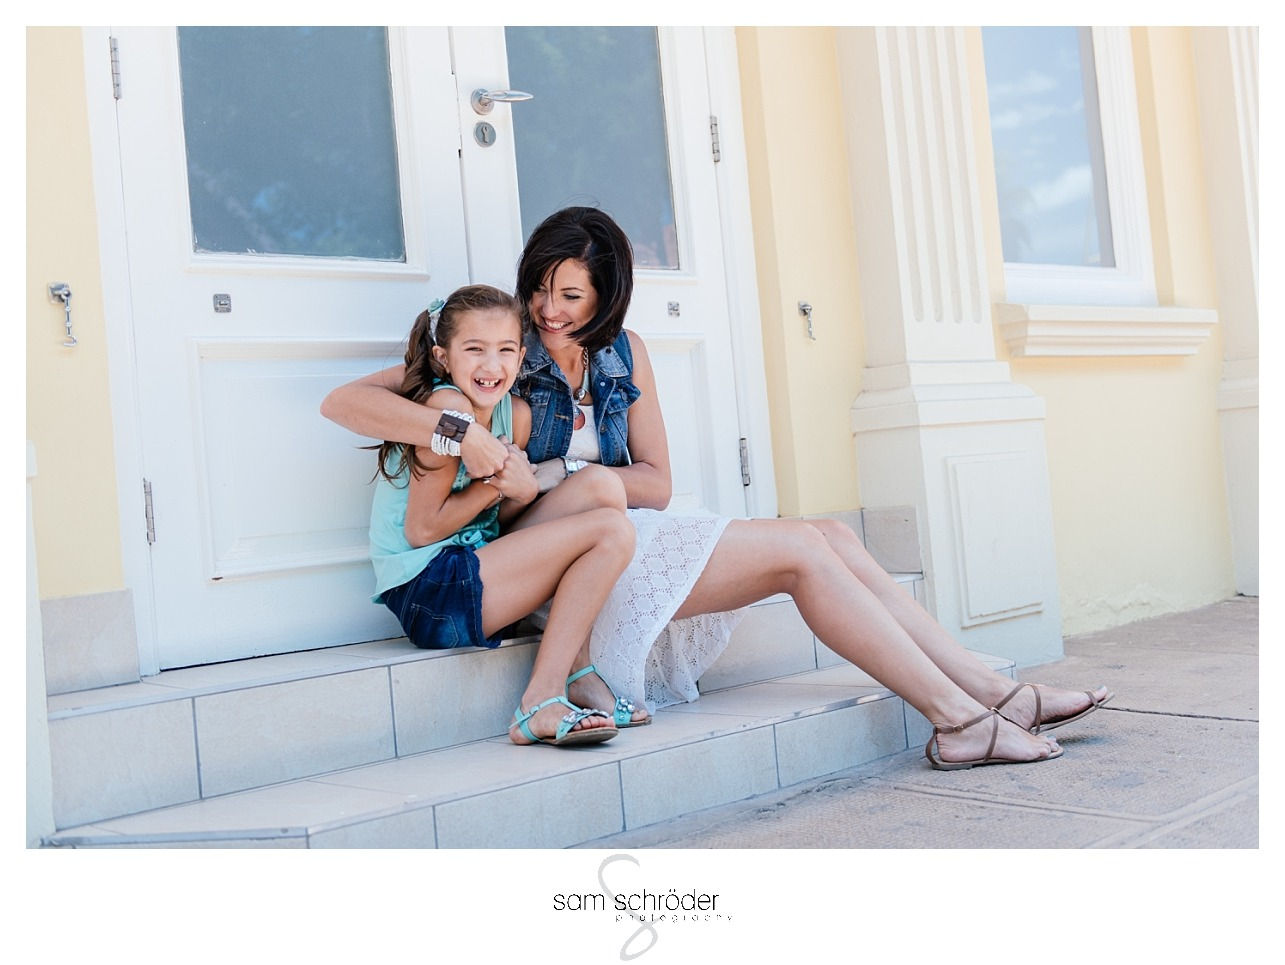 gauteng_-family_-lifestyle_photographer_gold-reef-city_-sam-schroder-photography_0010